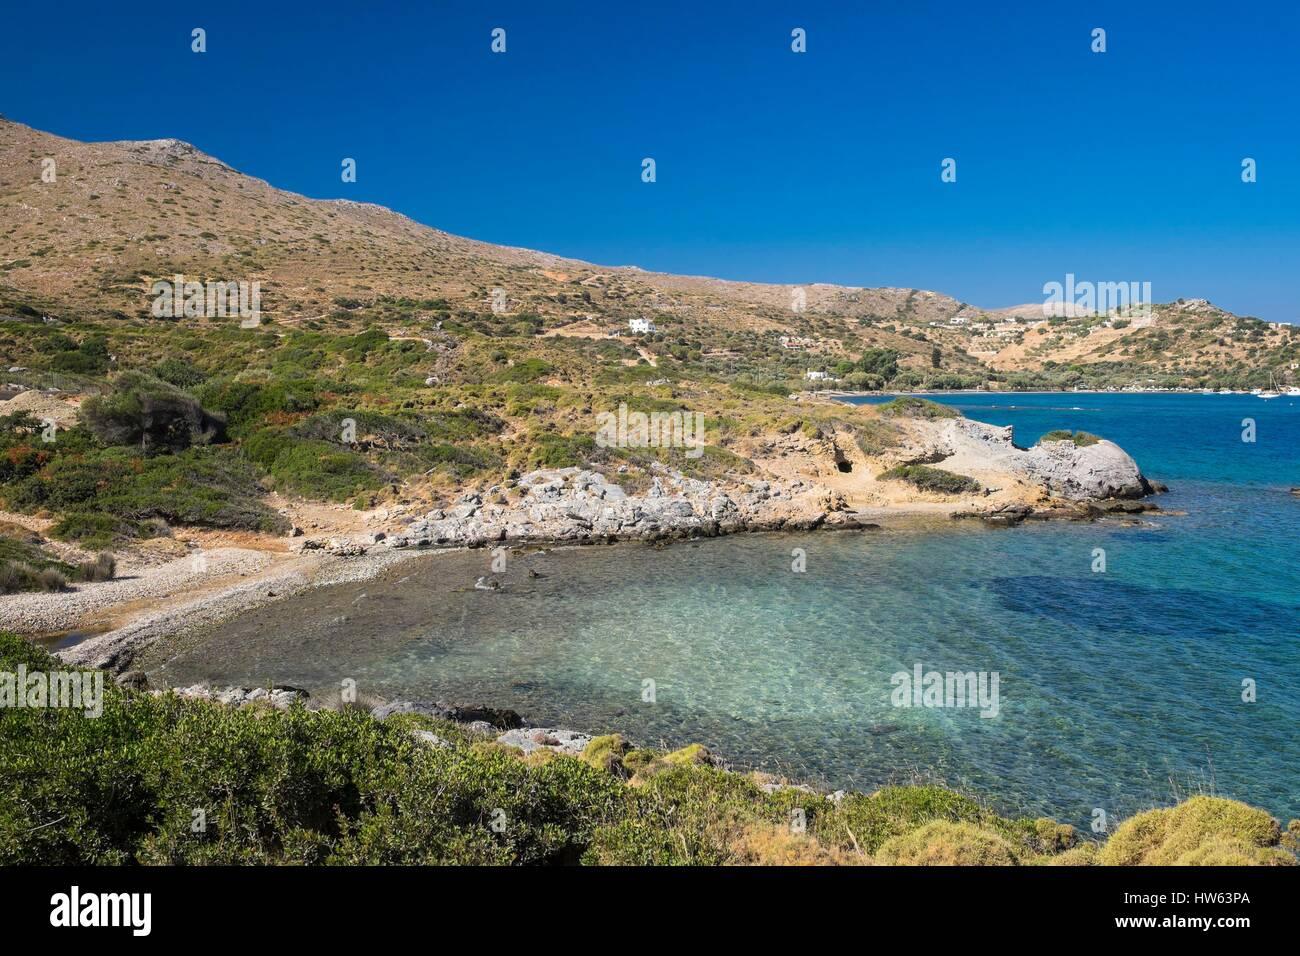 Greece, Dodecanese archipelago, Leros island, Blefouti bay - Stock Image